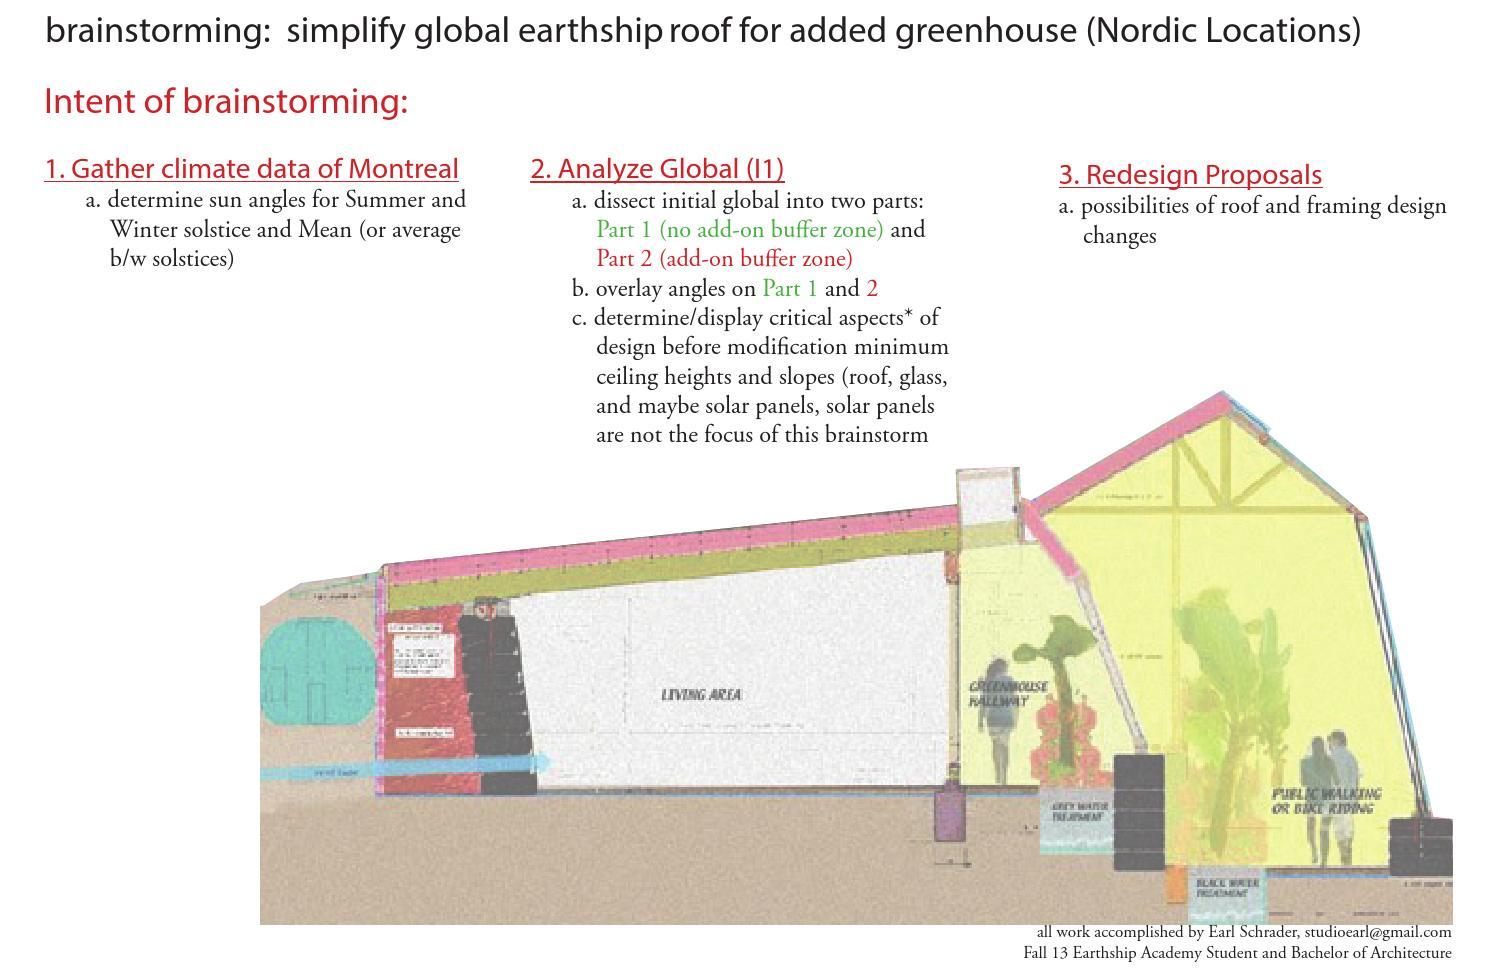 Brainstorming improving global earthships for nordic by earl brainstorming improving global earthships for nordic by earl schrader issuu pooptronica